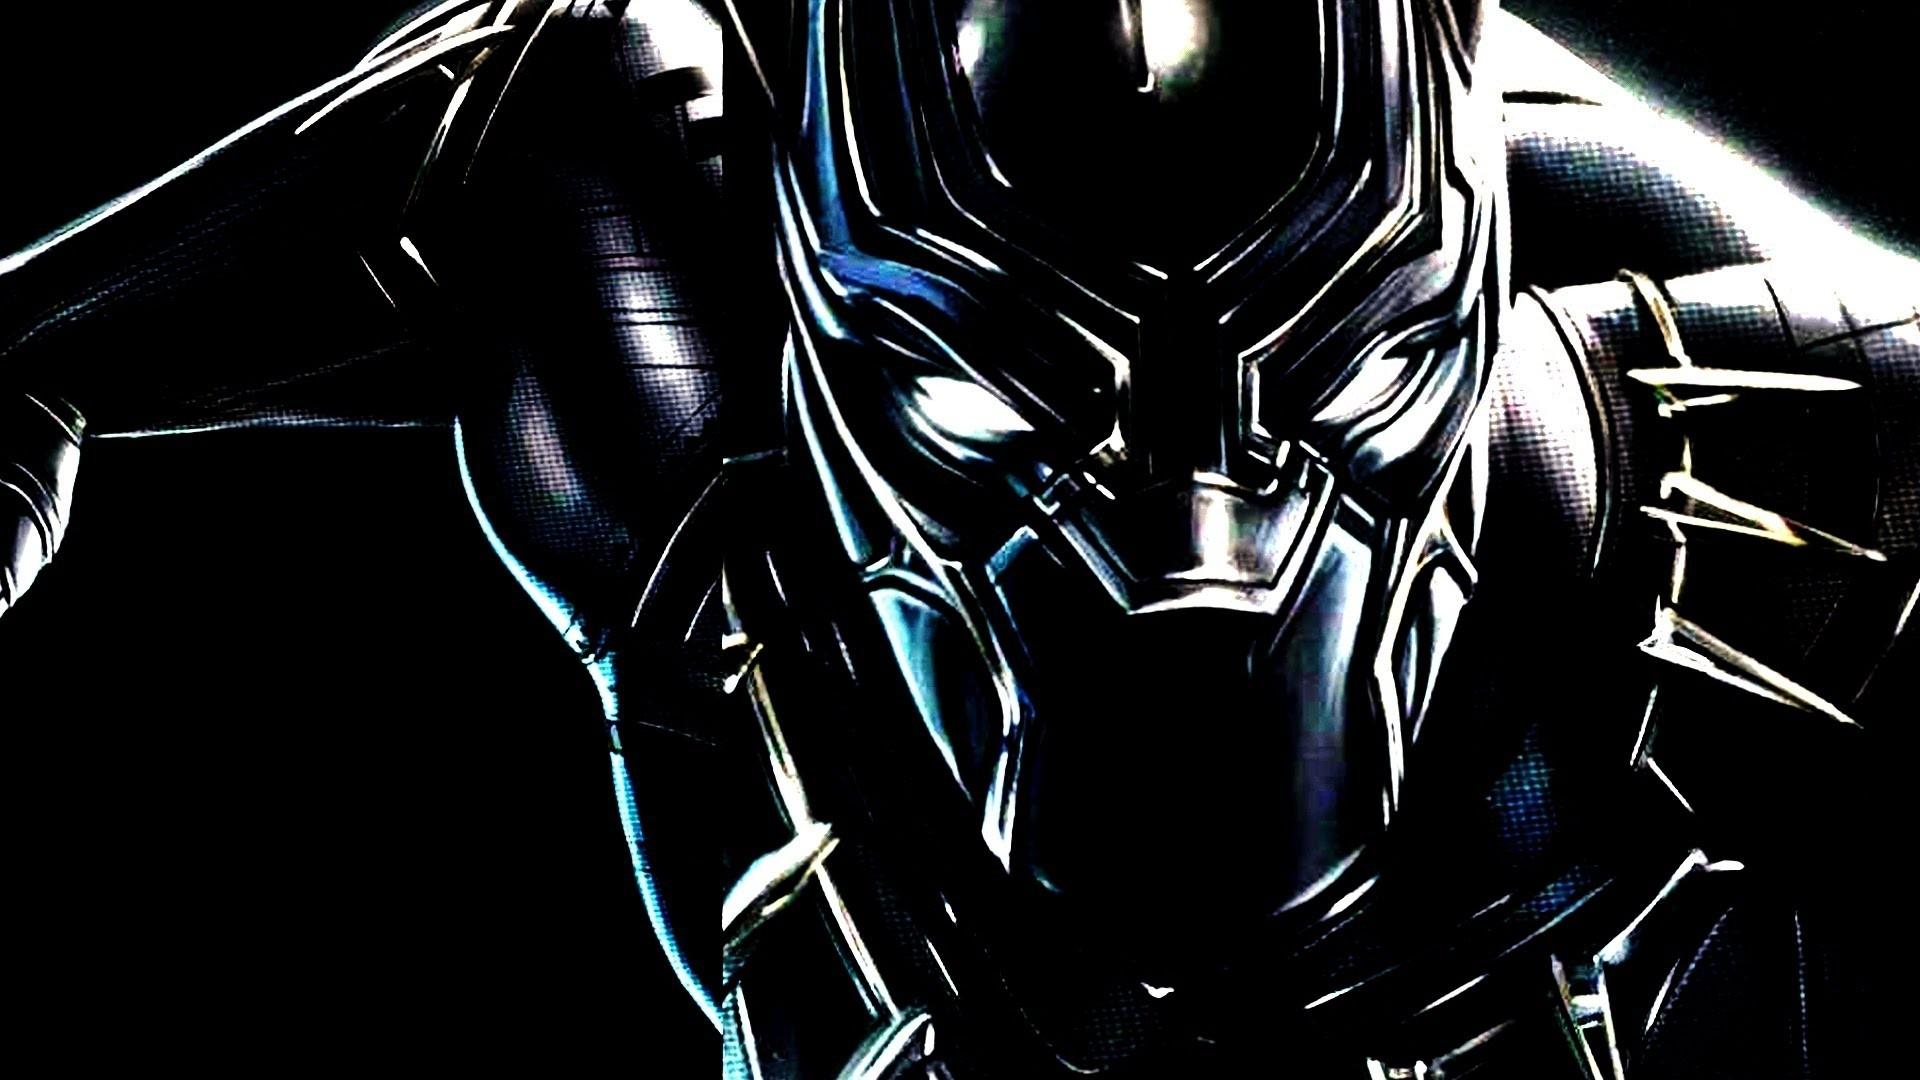 10 Latest Marvel Black Panther Wallpaper Hd FULL HD 1920 ...